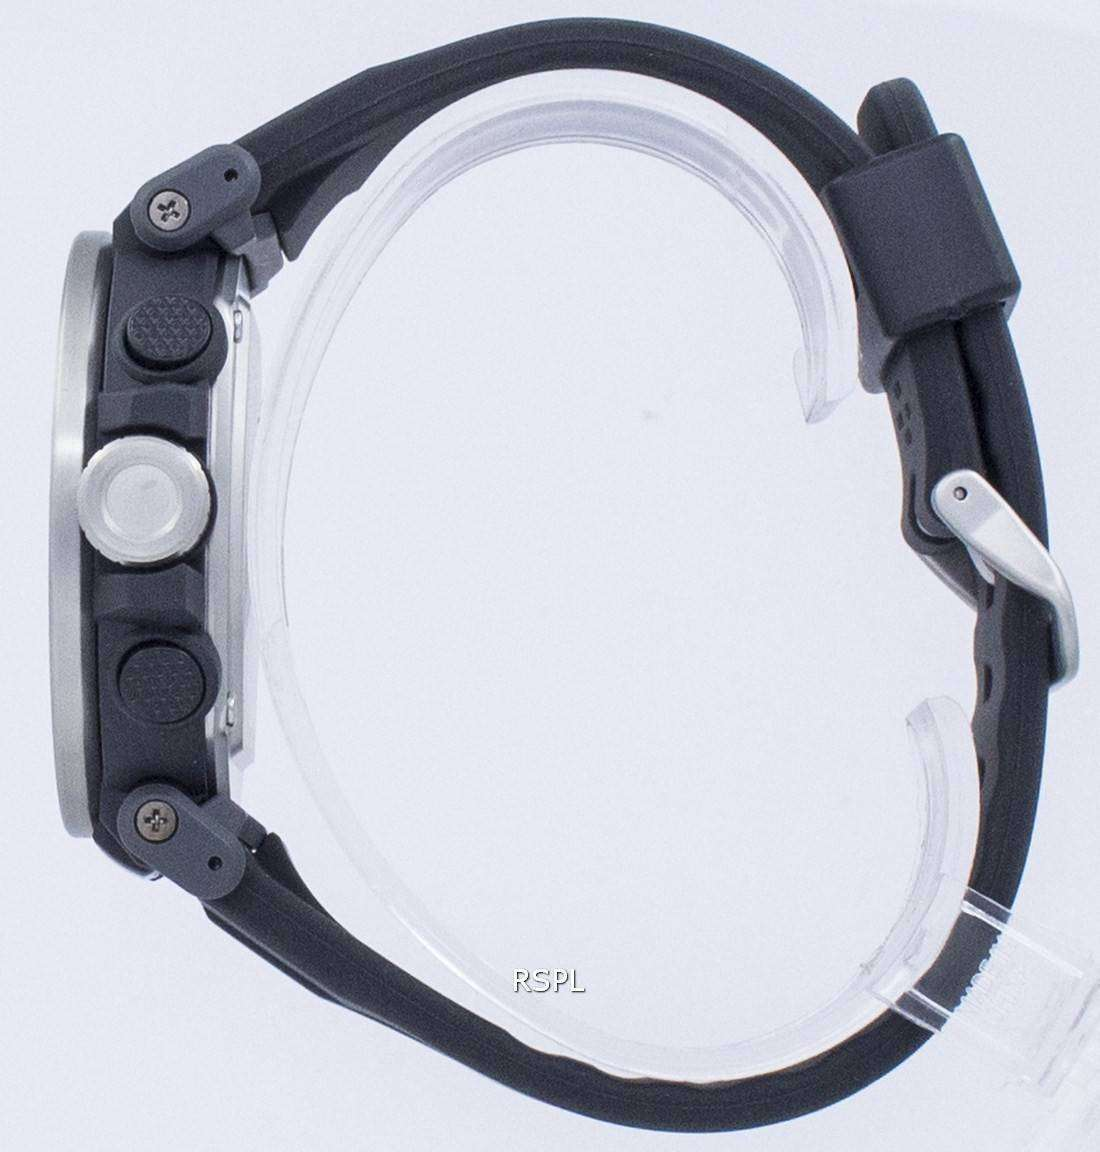 Reloj Casio ProTrek Triple Sensor Tough Solar PRG 600 1 PRG600 1 de los hombres